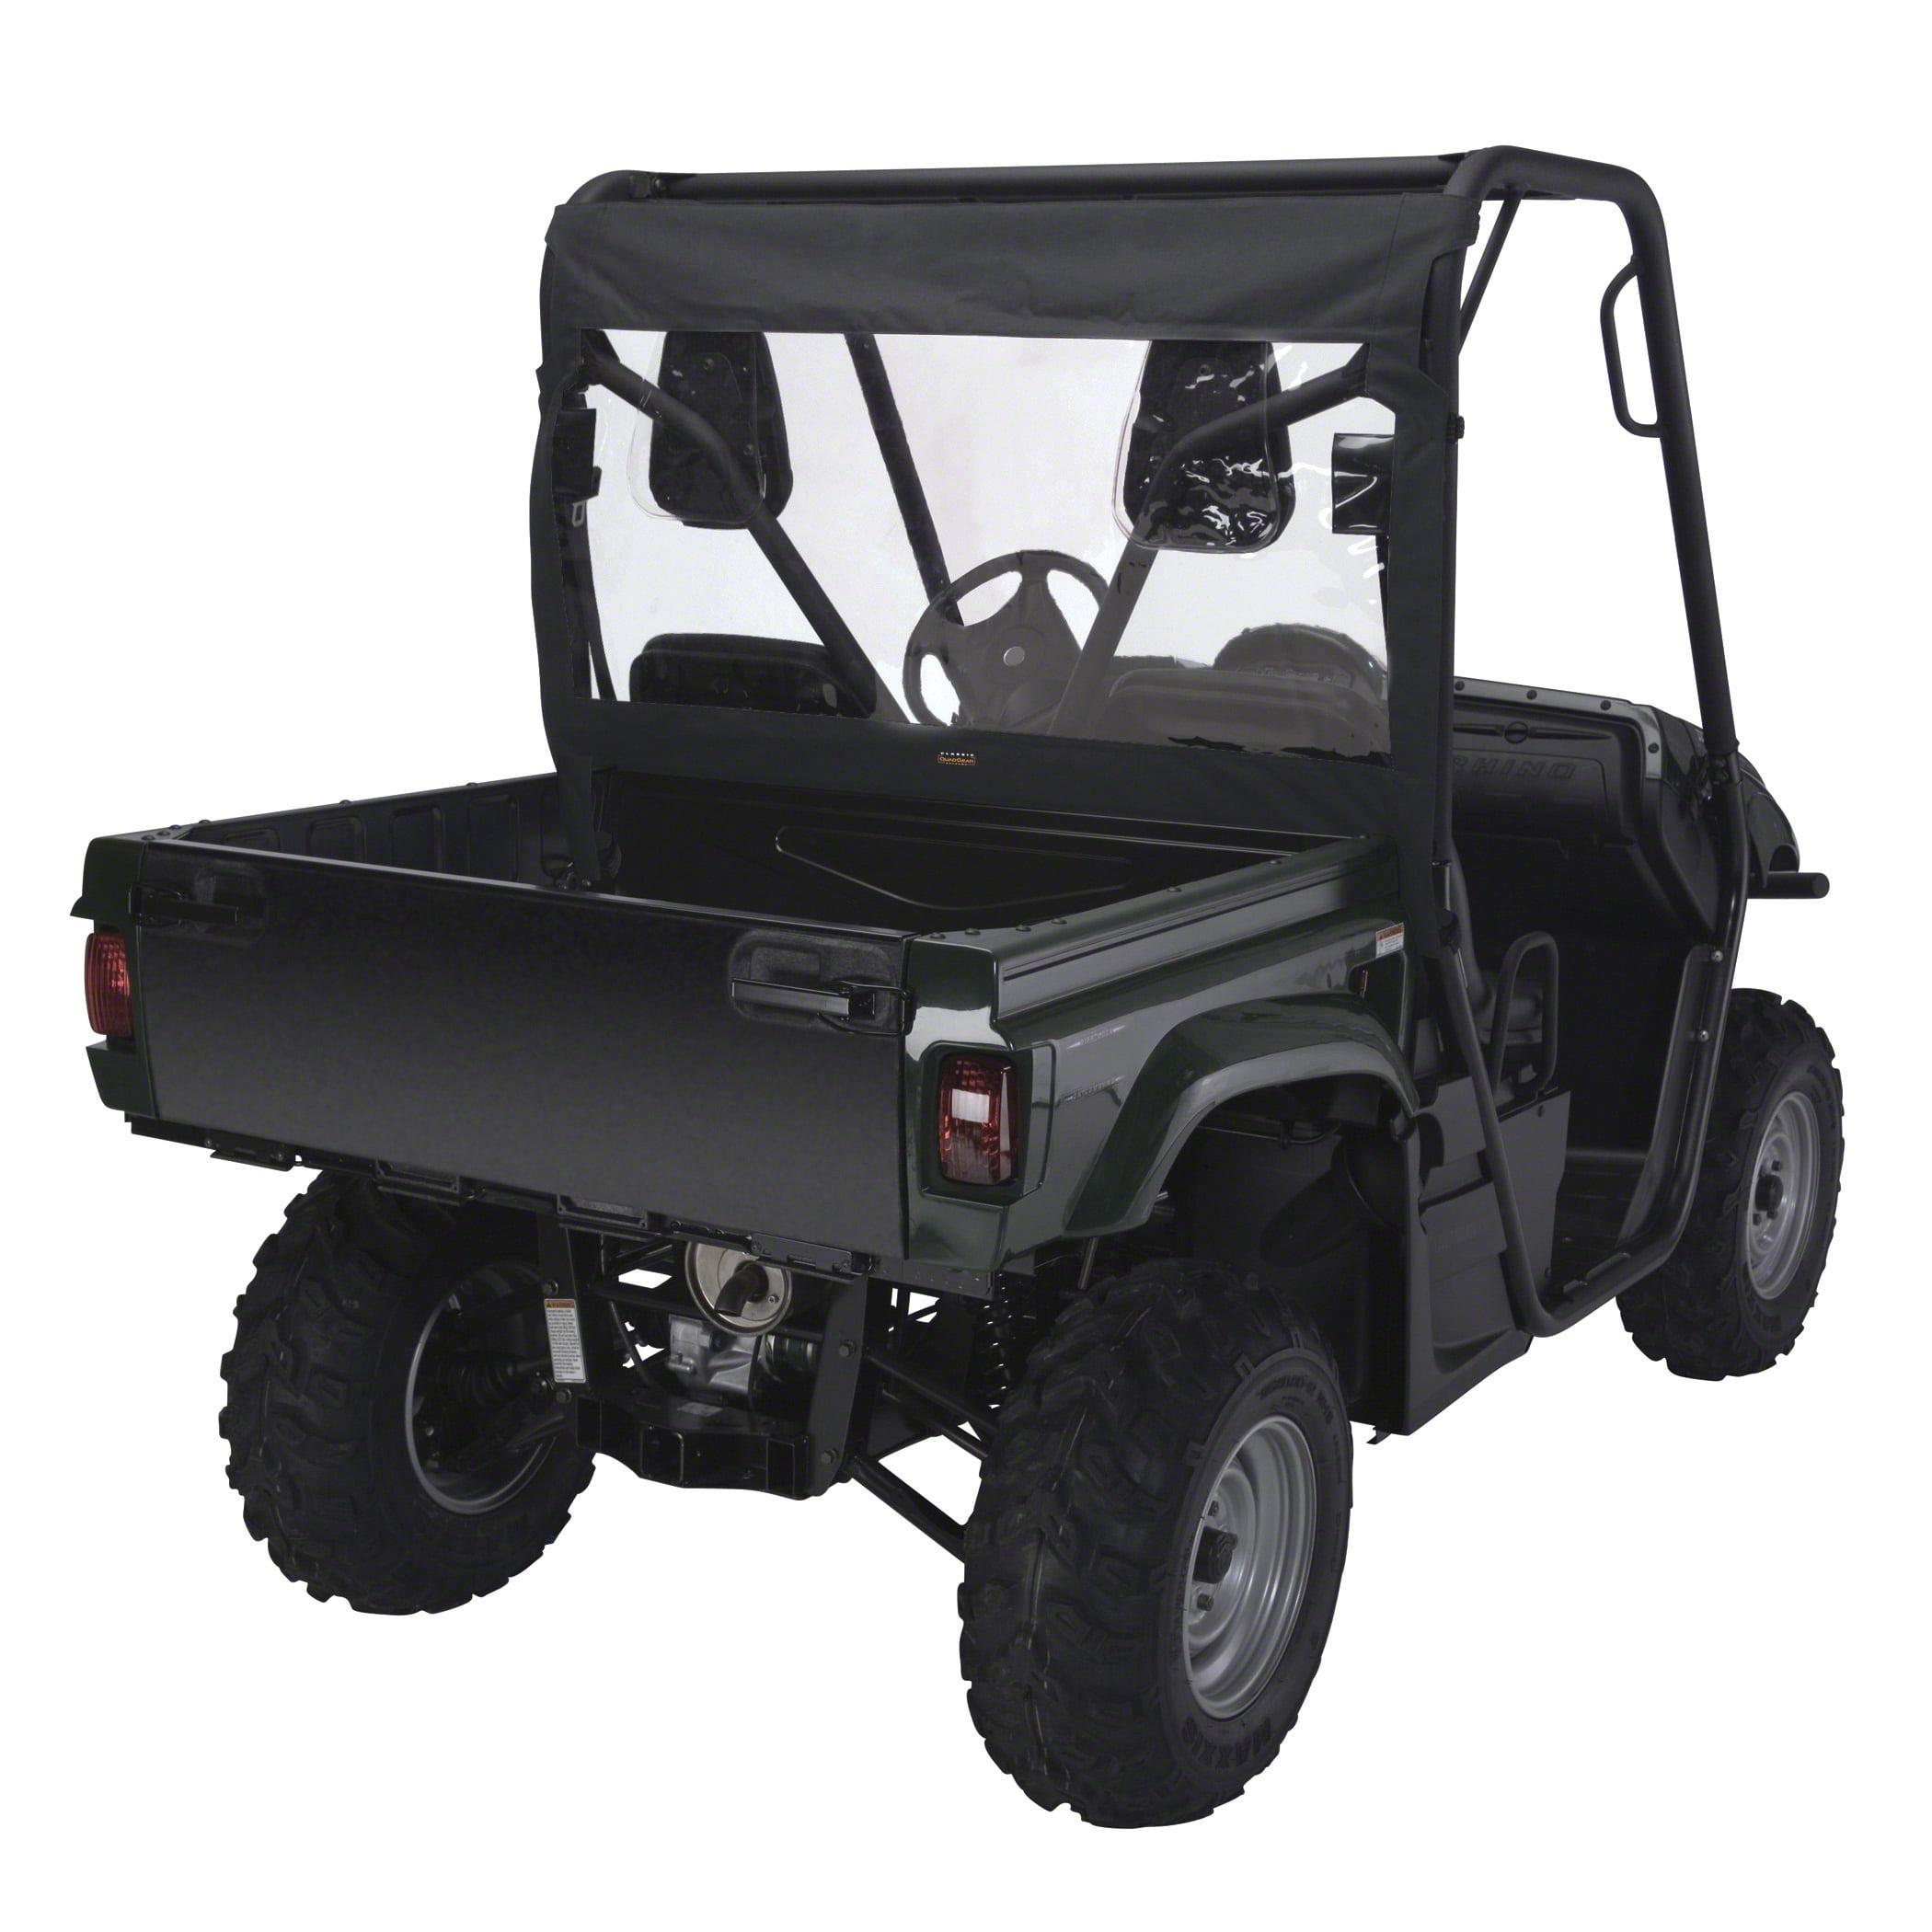 Classic Accessories QuadGear UTV Rear Windshield Fits Polaris® Ranger